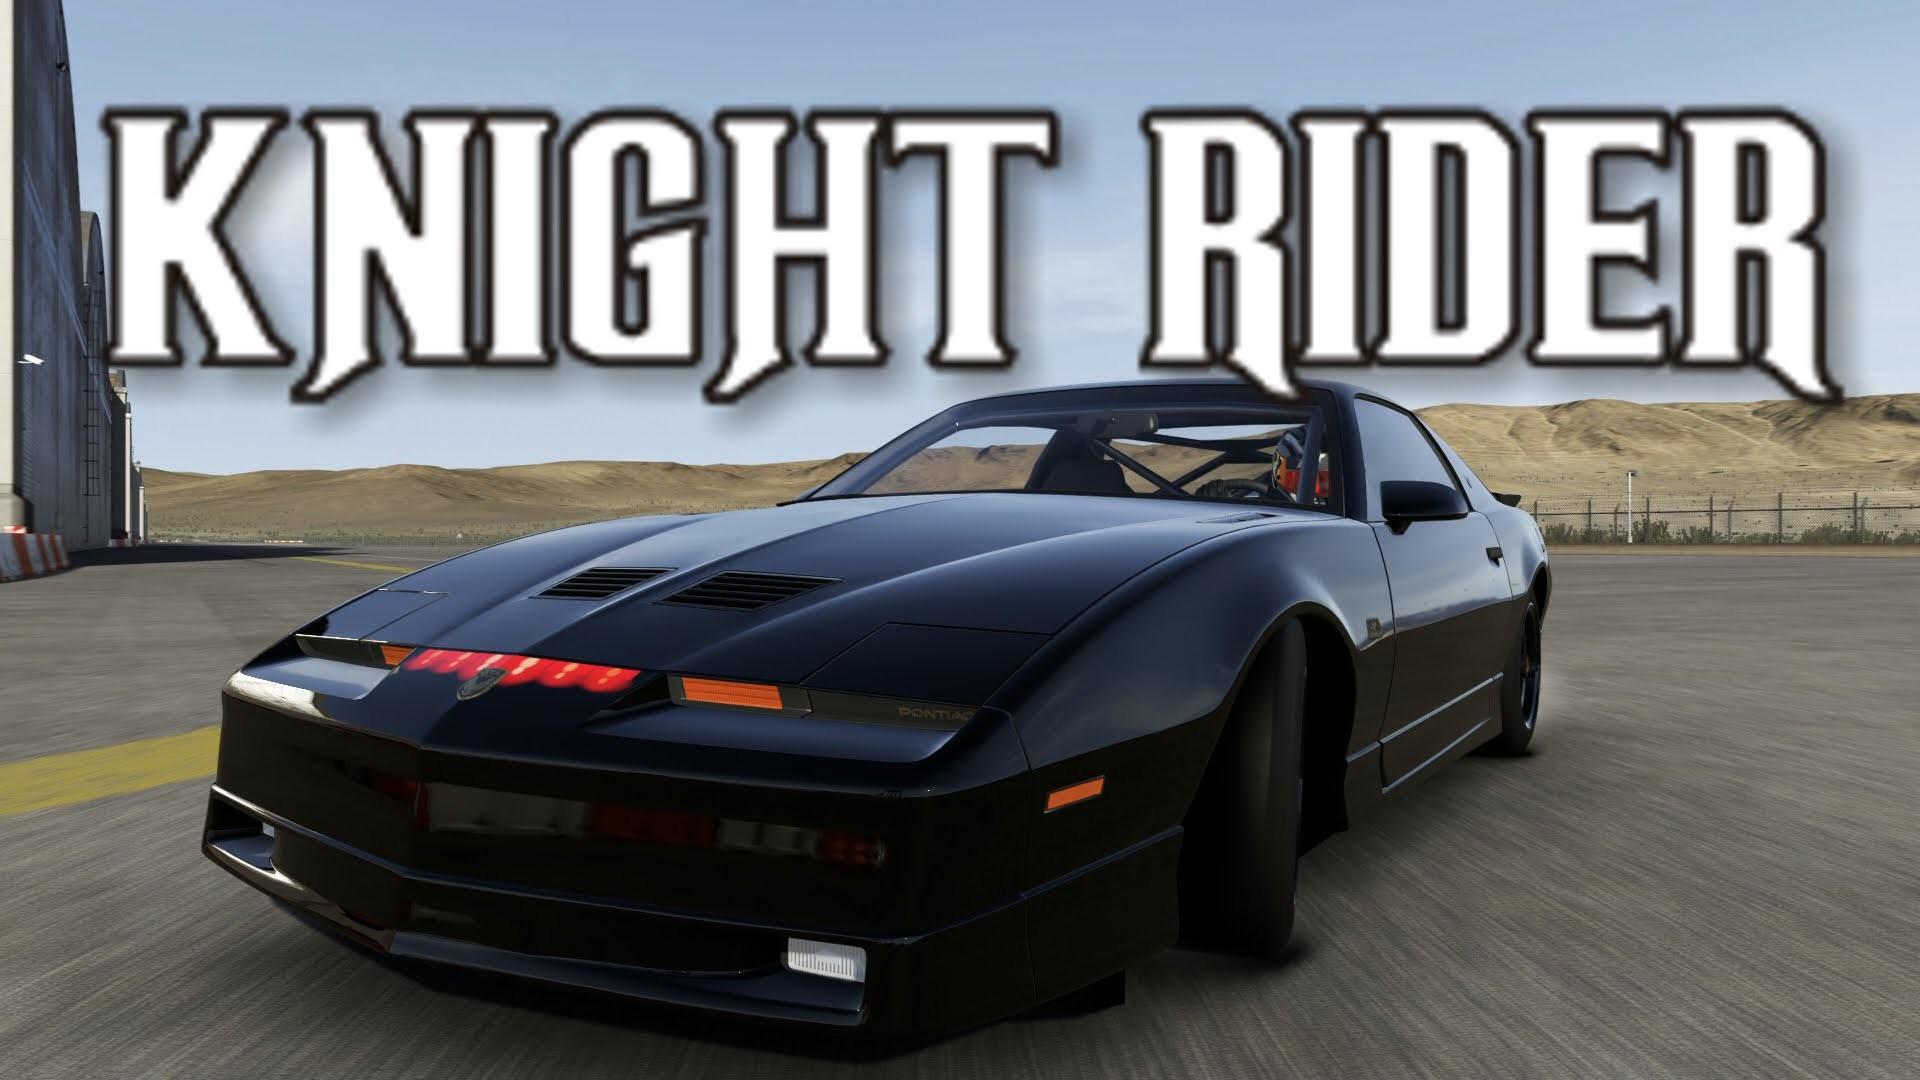 Knight Rider Wallpaper 61 Images